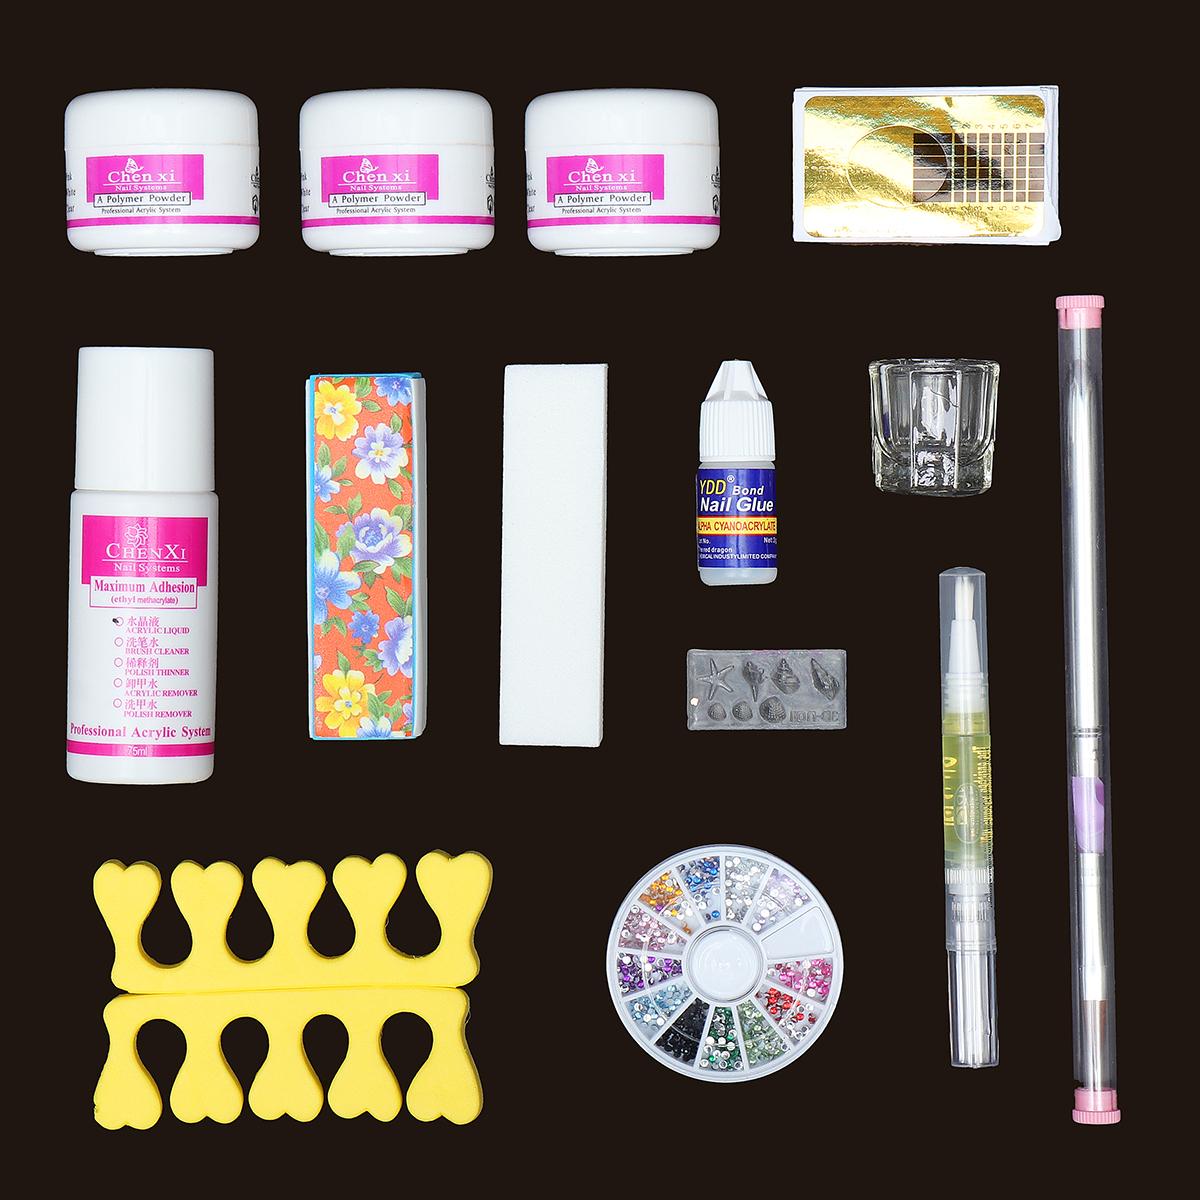 14 Acrylic Powder Nail Art Set False Nail Art Brushes D